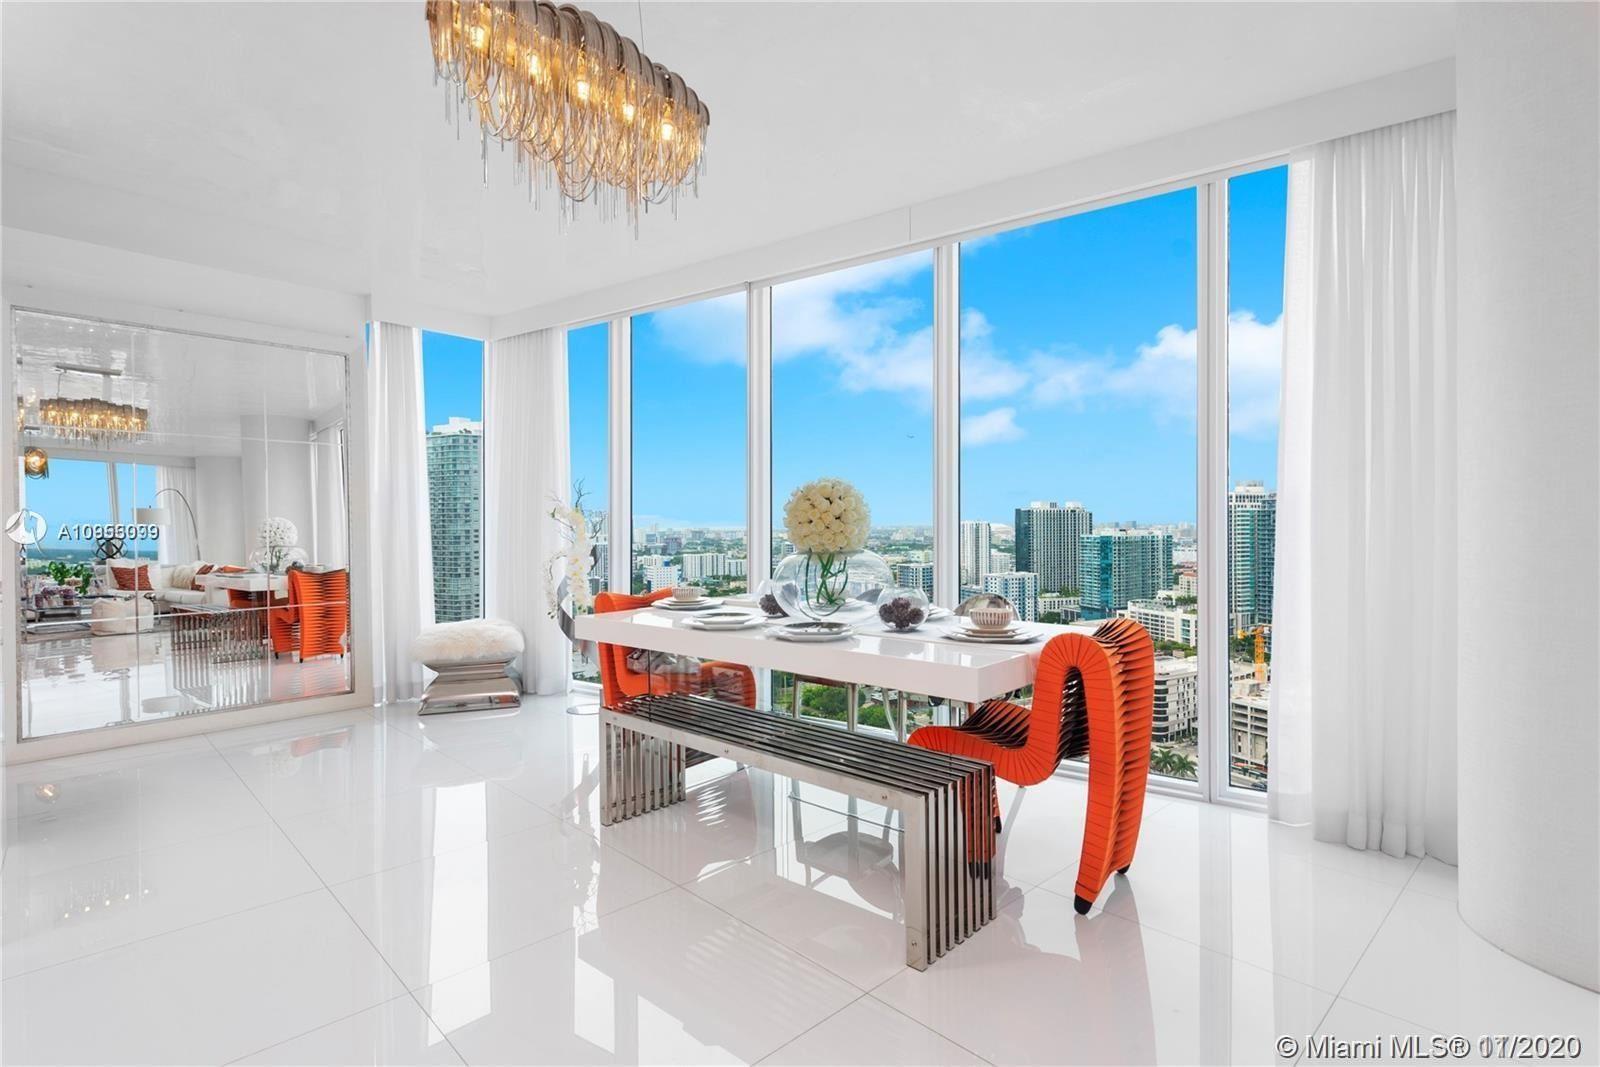 601 NE 36th street #3001, Miami, FL 33137 - #: A10953099